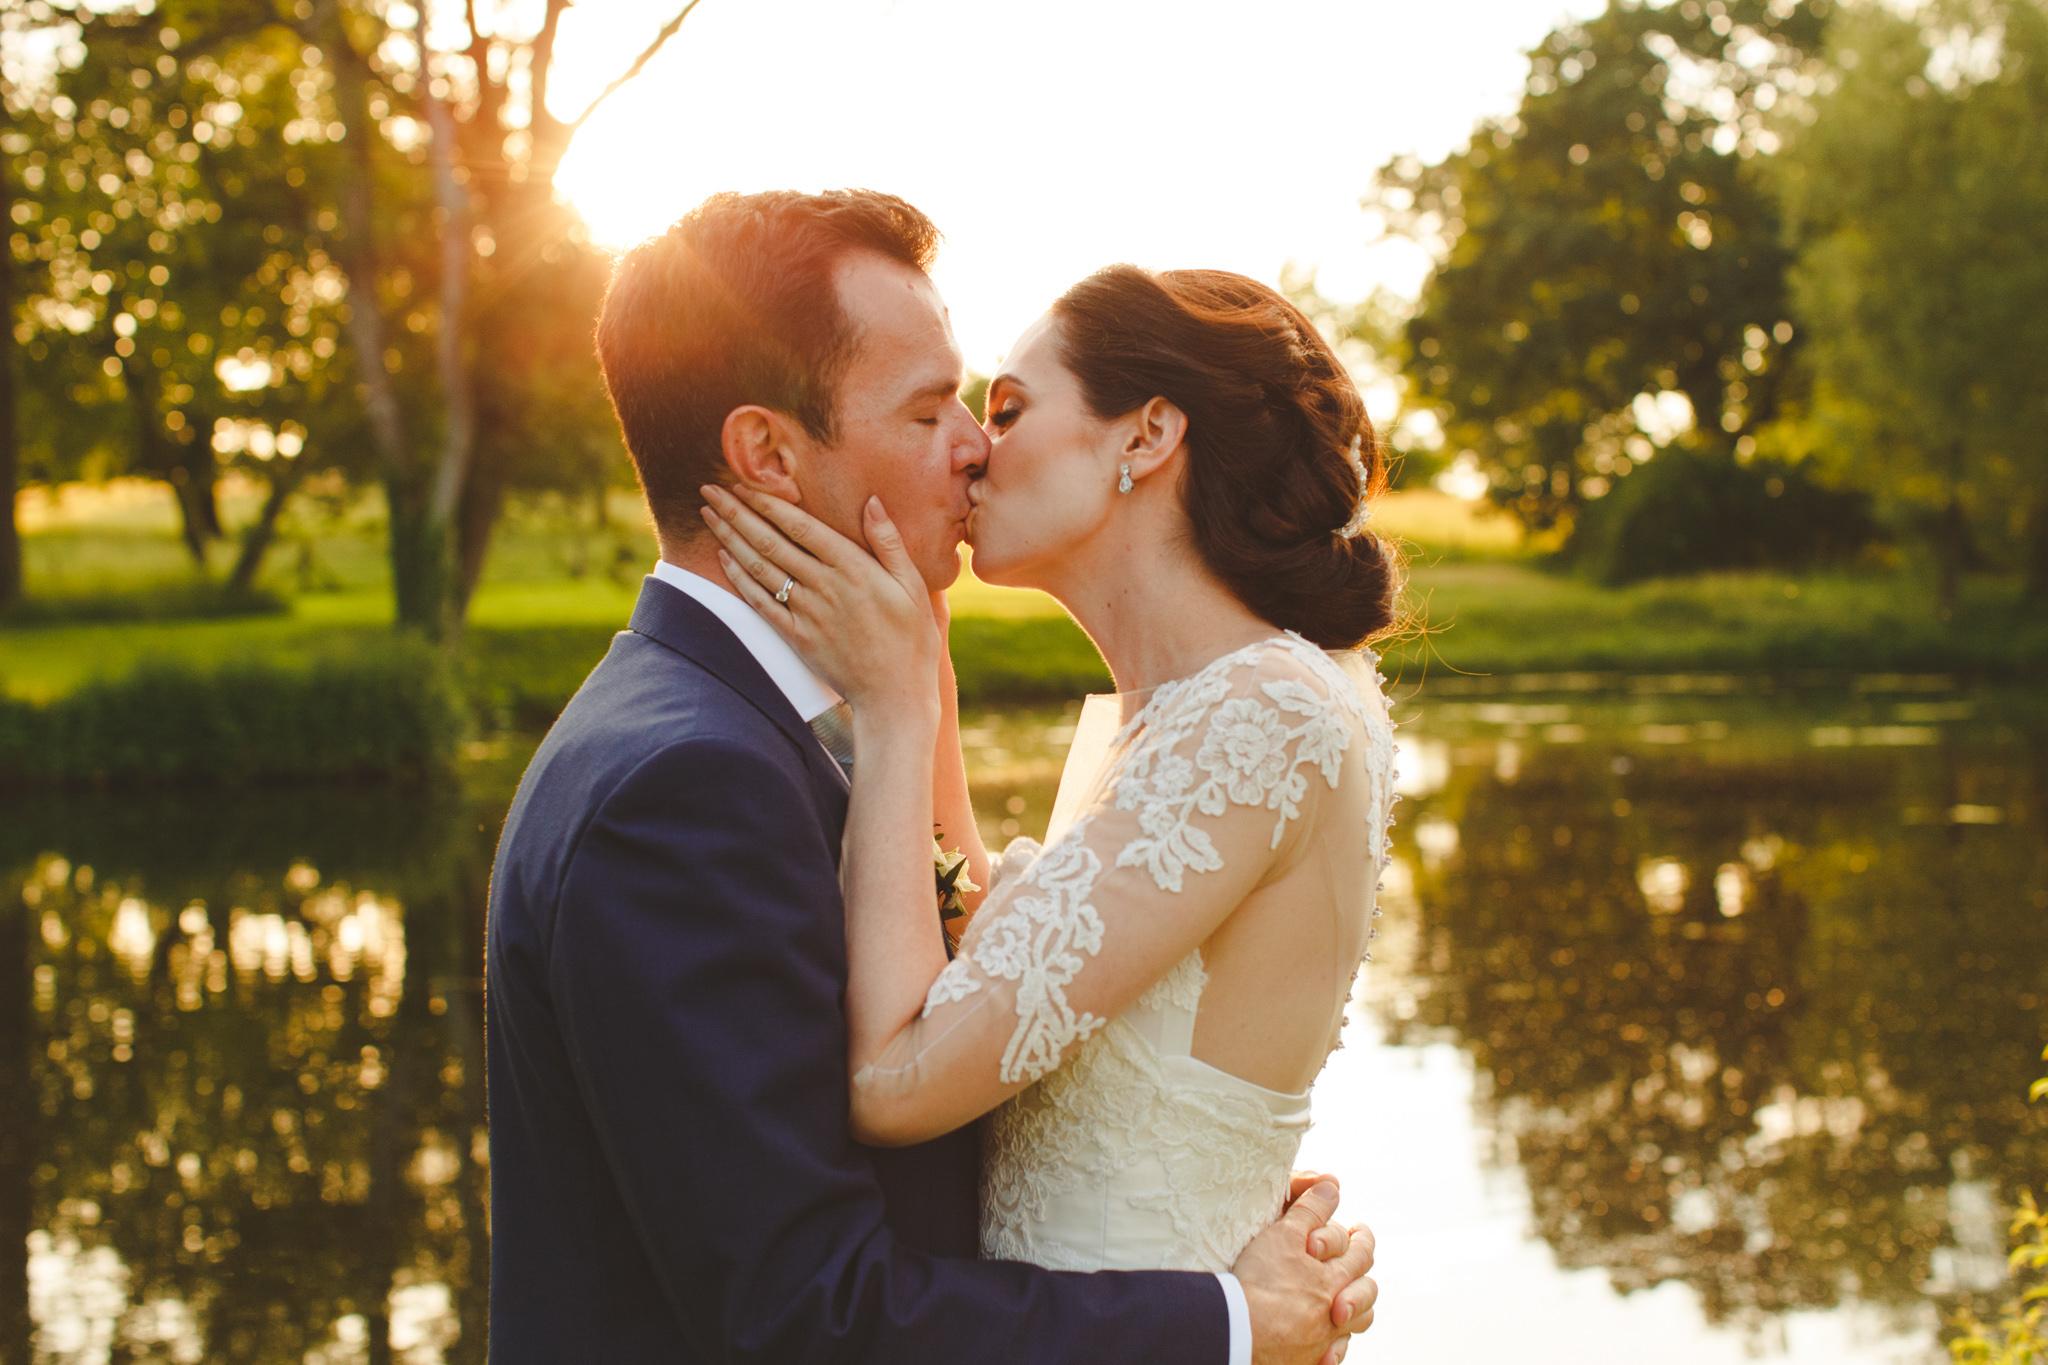 derbyshire-wedding-photographer-videographer-camera-hannah-10.jpg